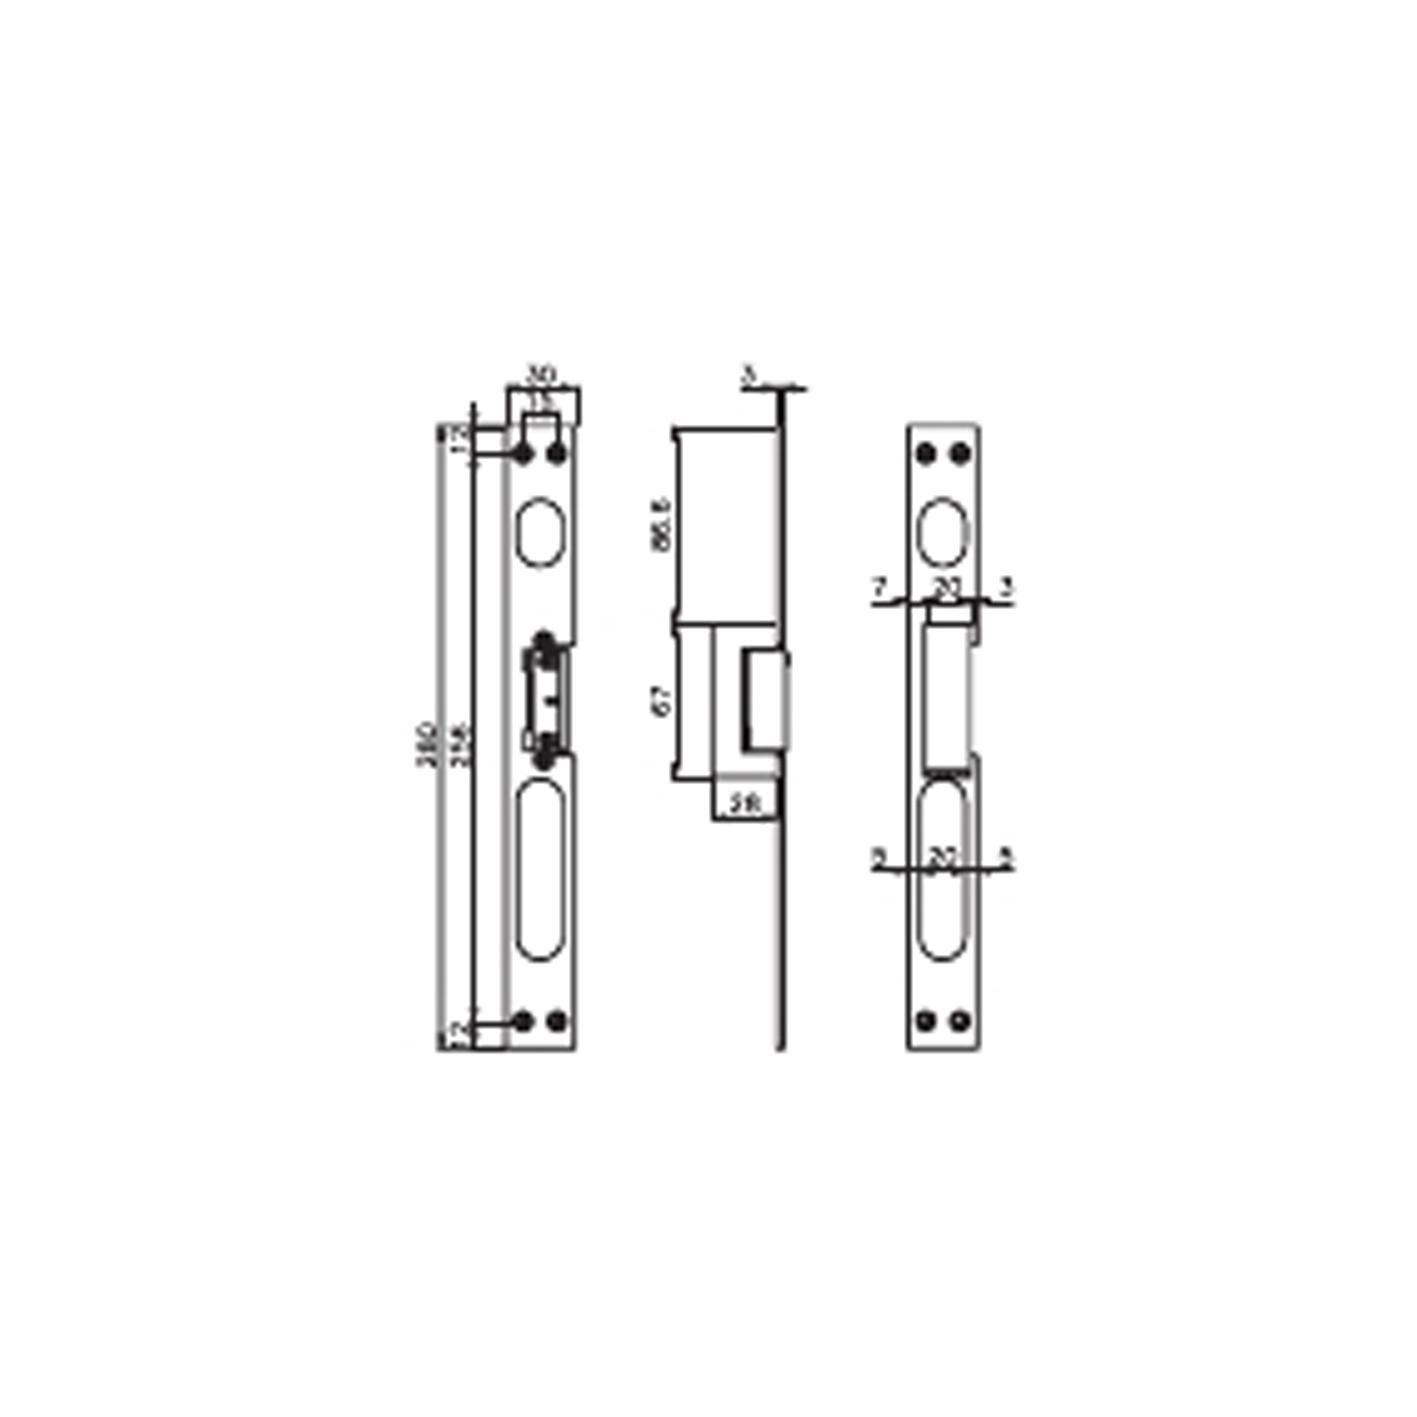 Kale KD012/20-124 Gizli Kapı Otomatiği